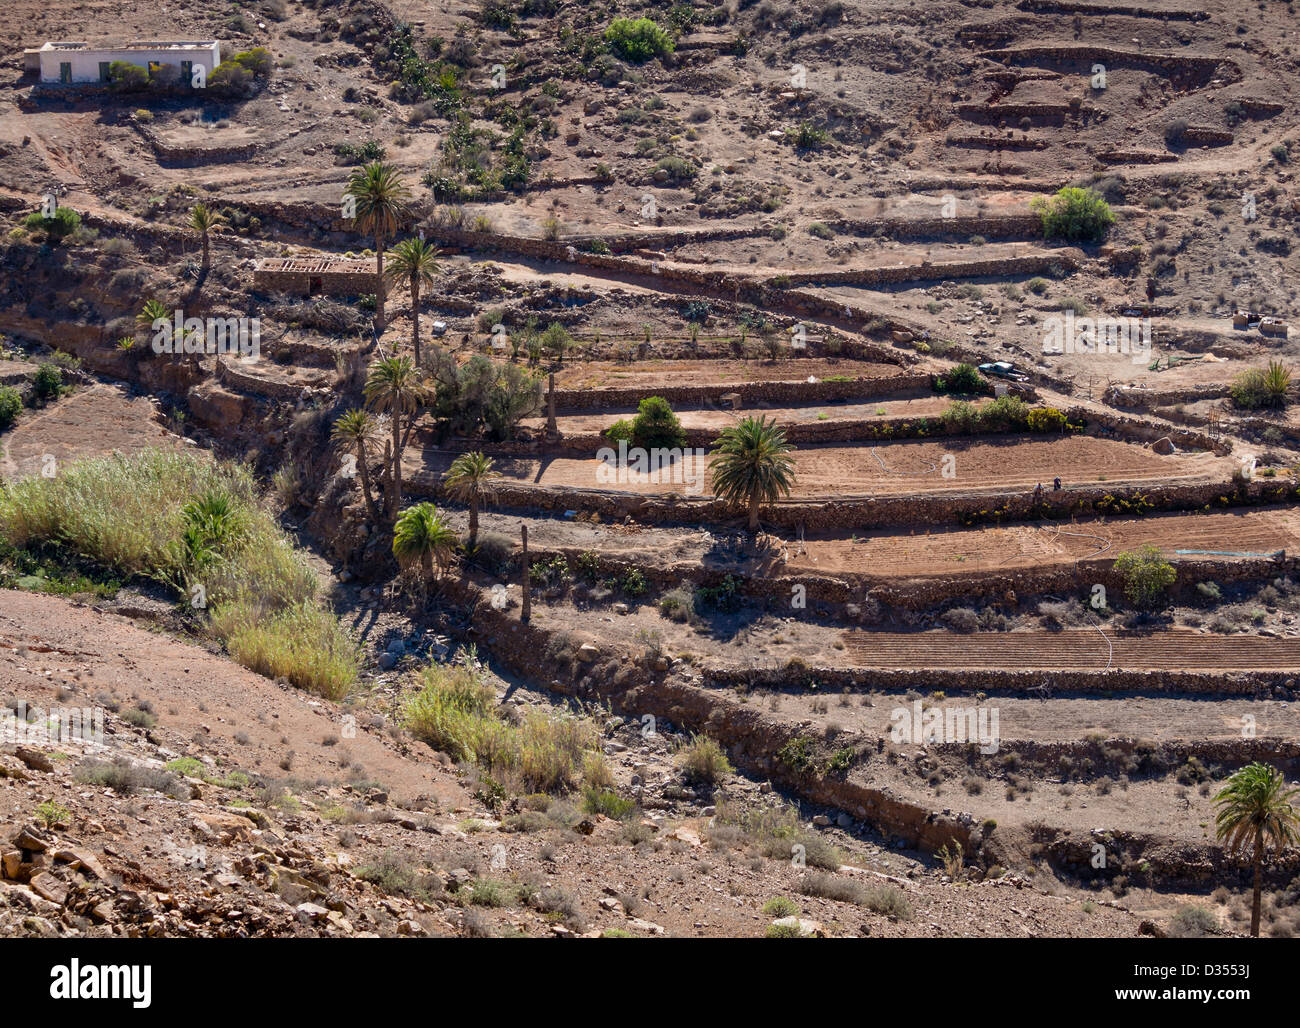 An oasis in the Parque Rural de Betancuria, Fuerteventura. Stock Photo